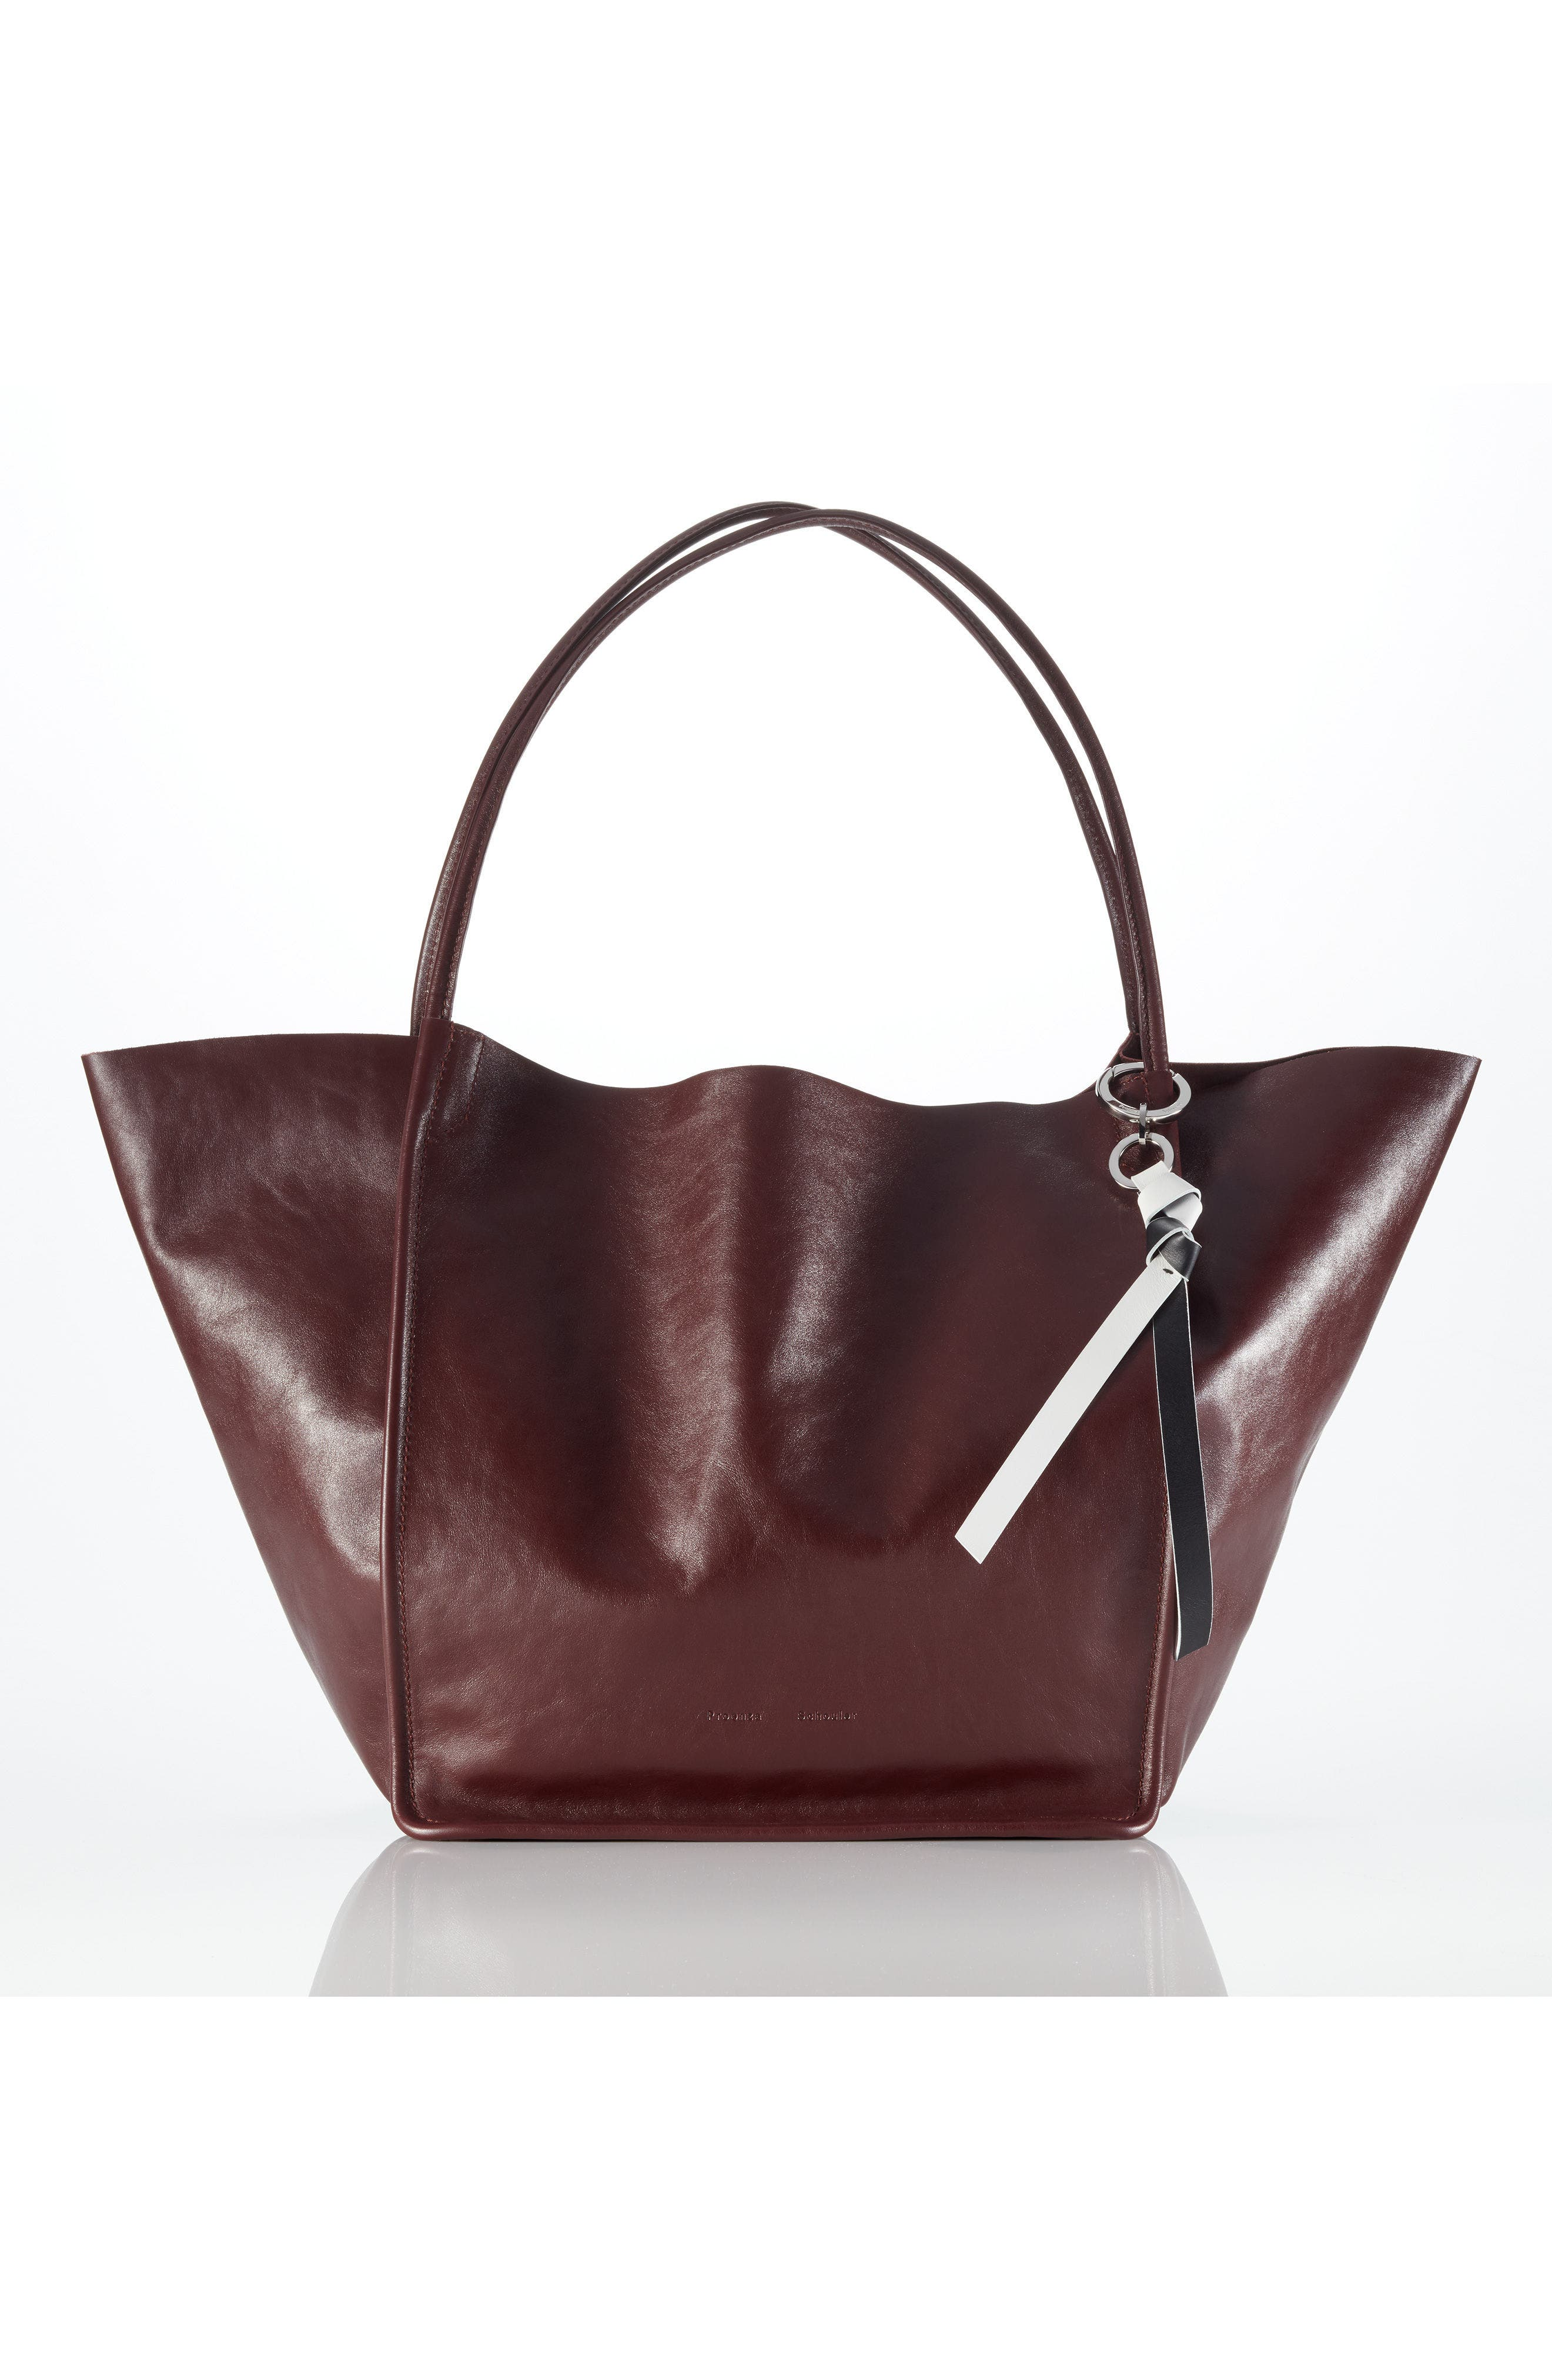 Small Suede Shoulder Bag,                             Alternate thumbnail 6, color,                             NERO/ NERO/ VERT RED VERT